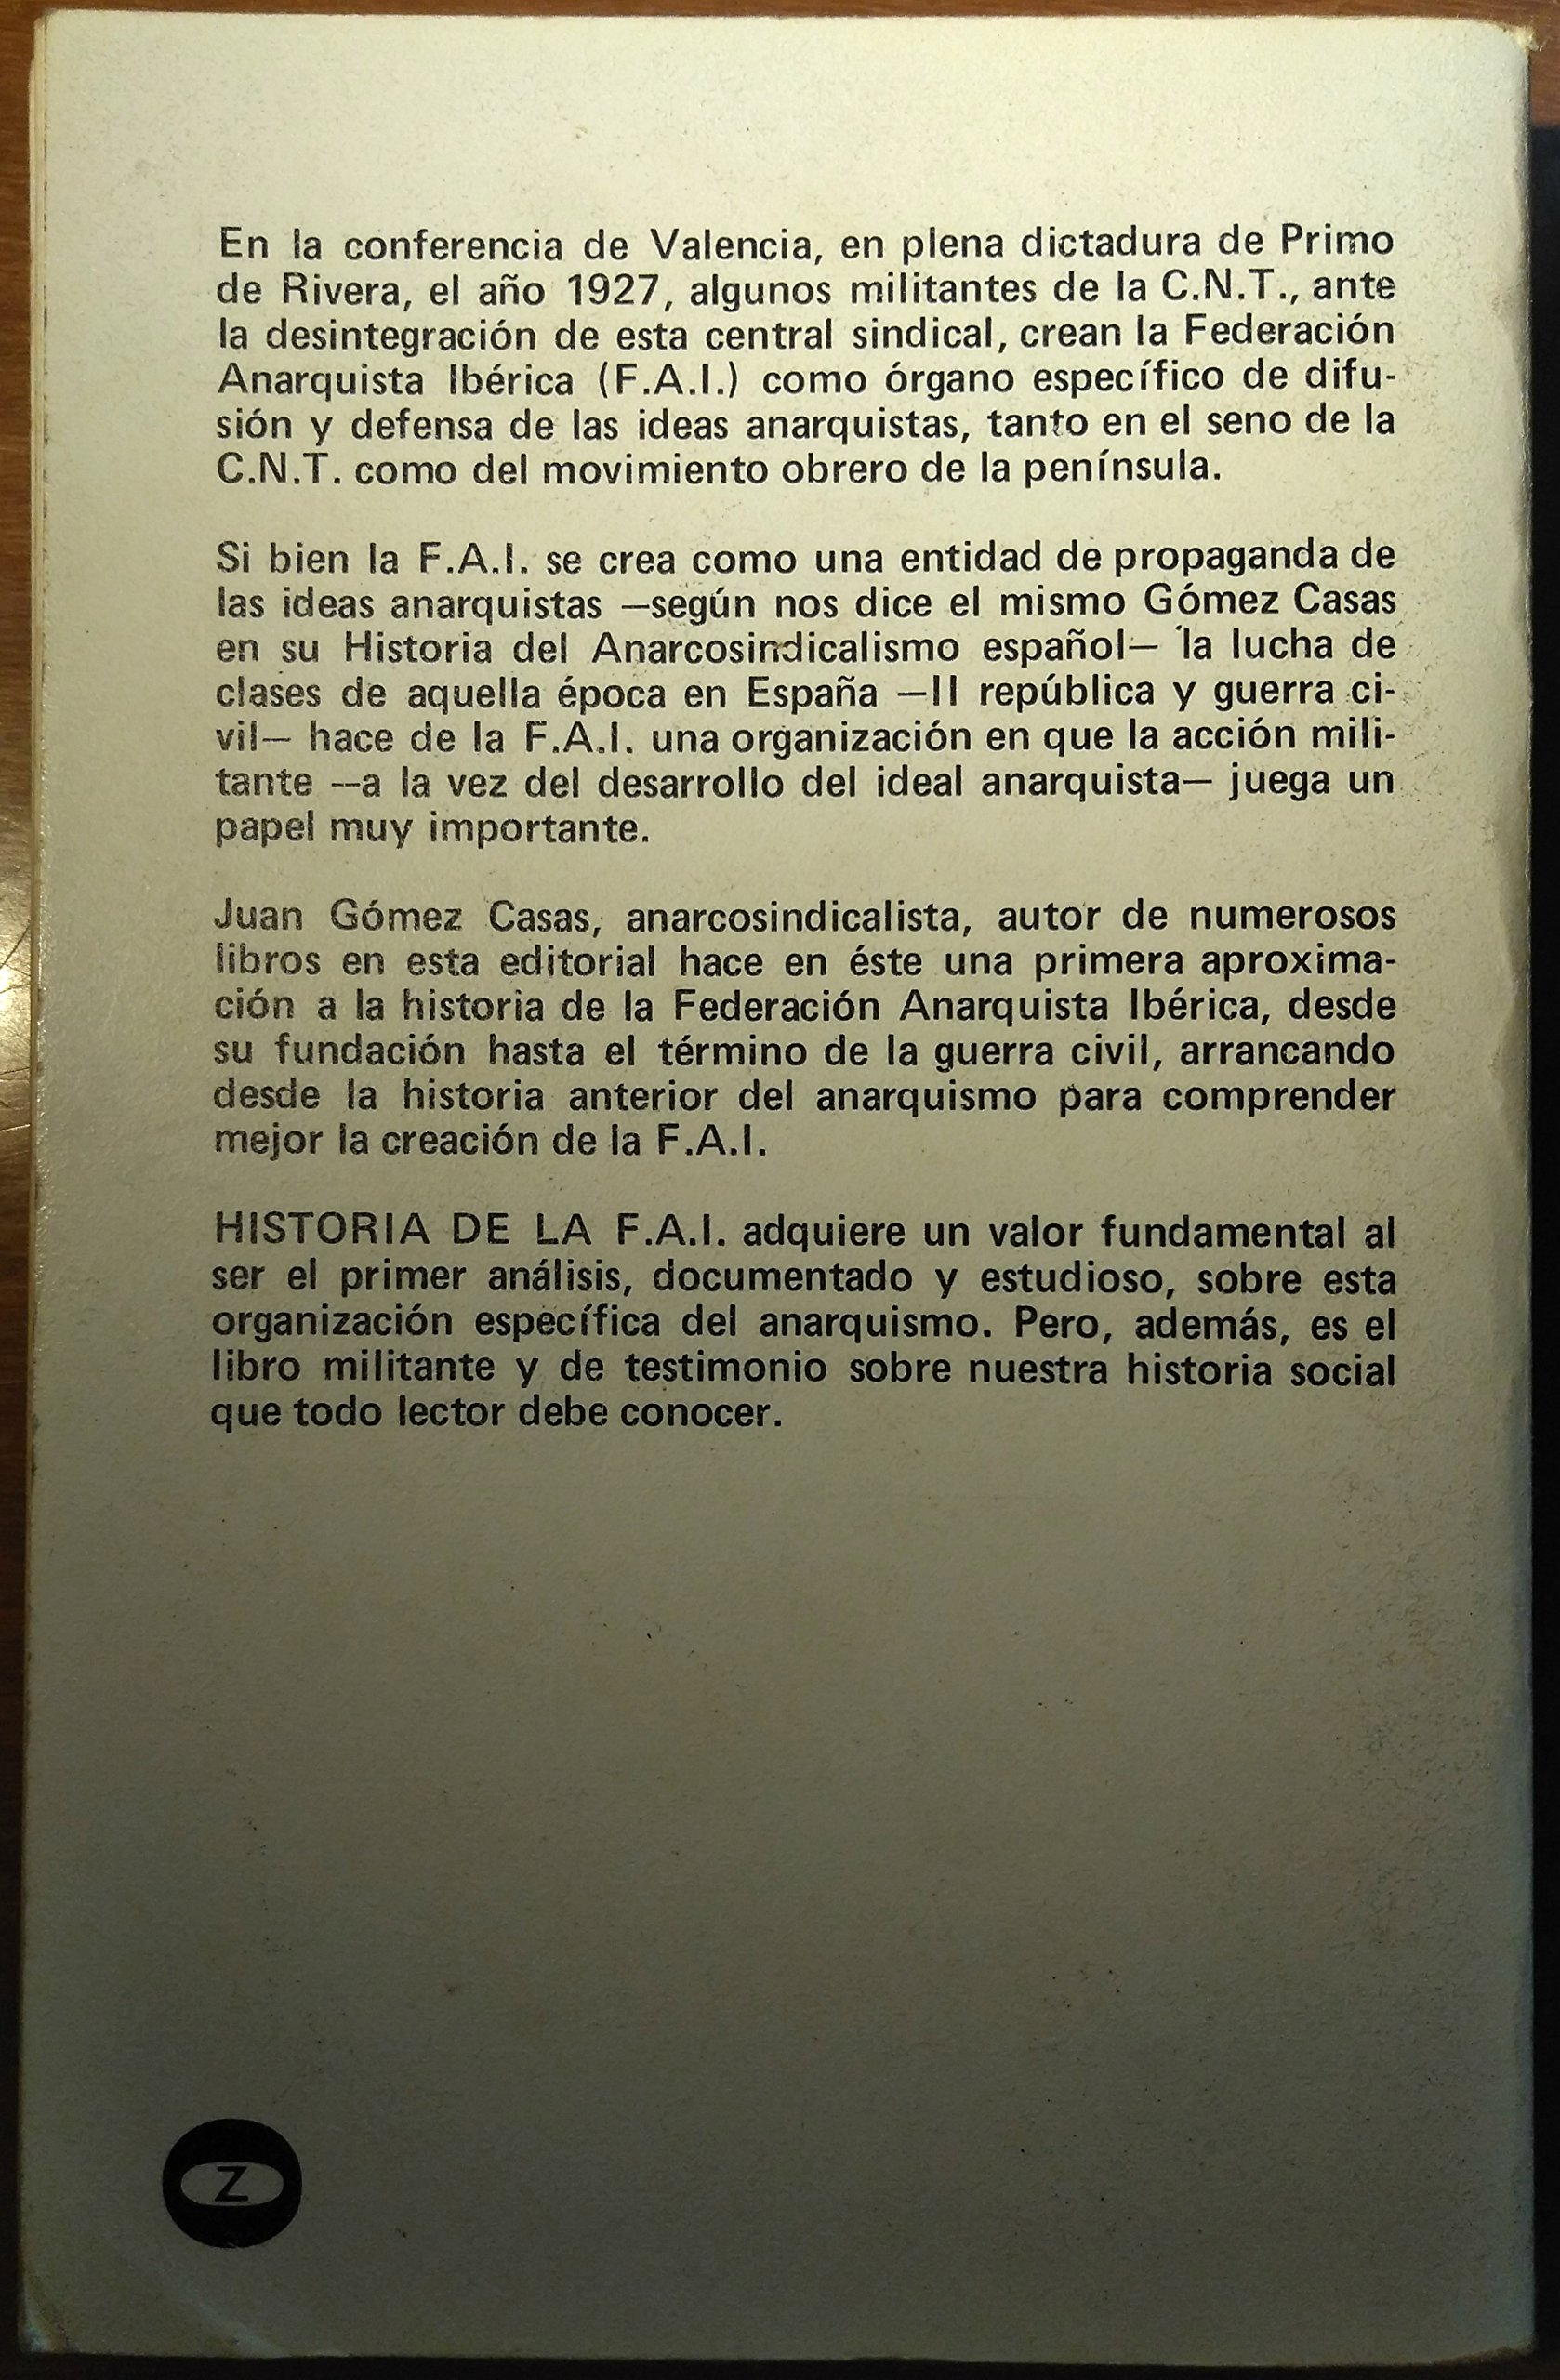 Gomez FaiAmazon CasasLibros La esJuan Historia De OPZkuXi